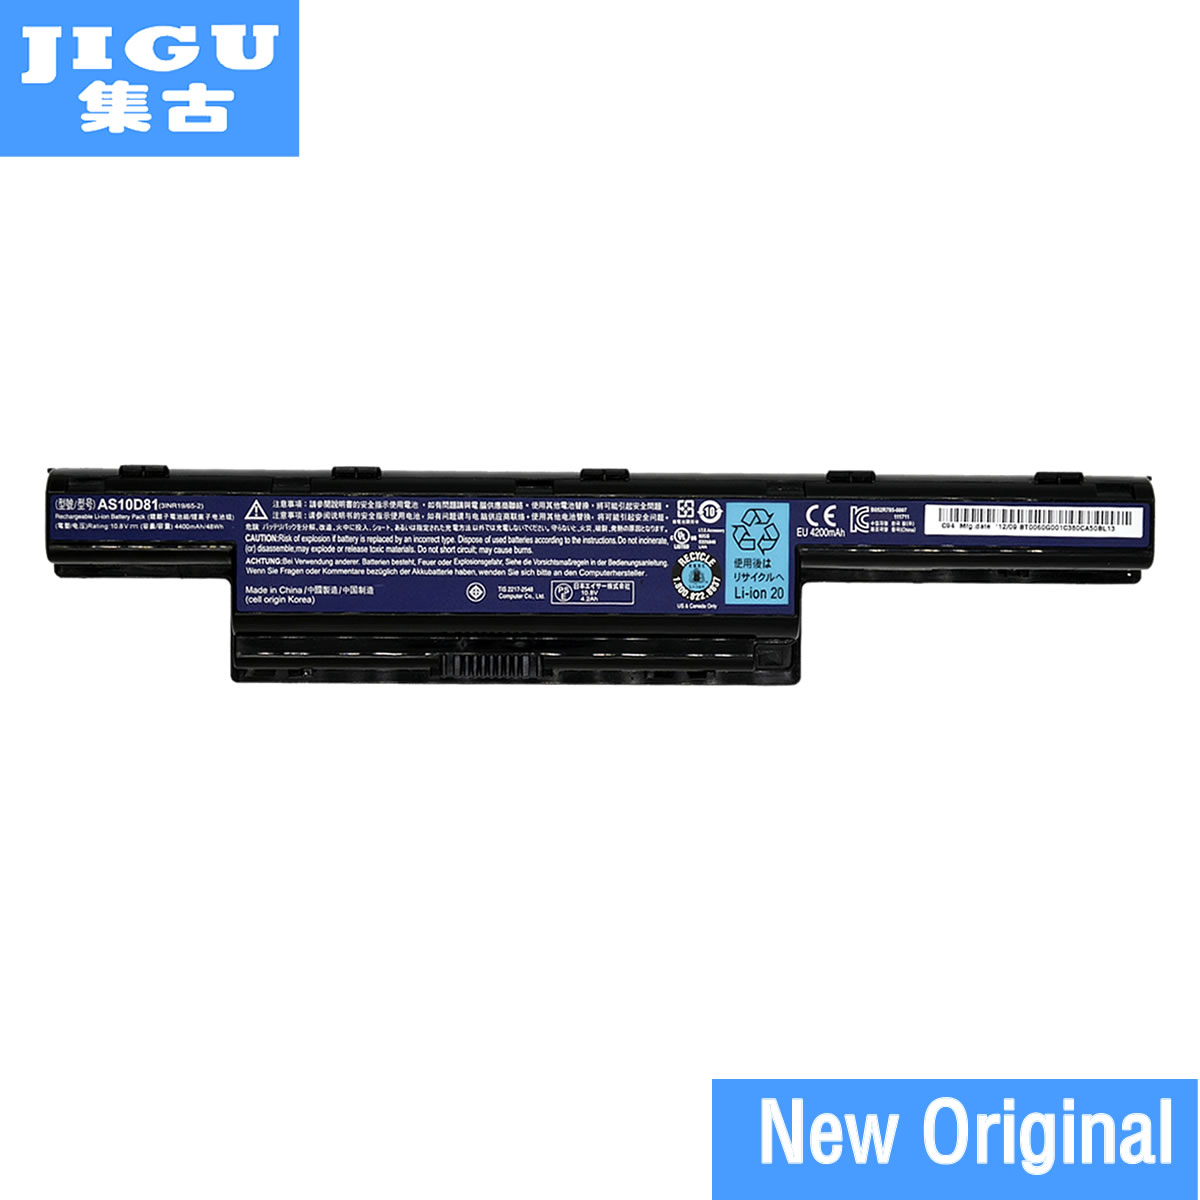 JIGU AS10D31 AS10D3E AS10D41 AS10D51 AS10D56 AS10D61 AS10D71 AS10D73 AS10D75 AS10D81 Original batería del ordenador portátil para ACER